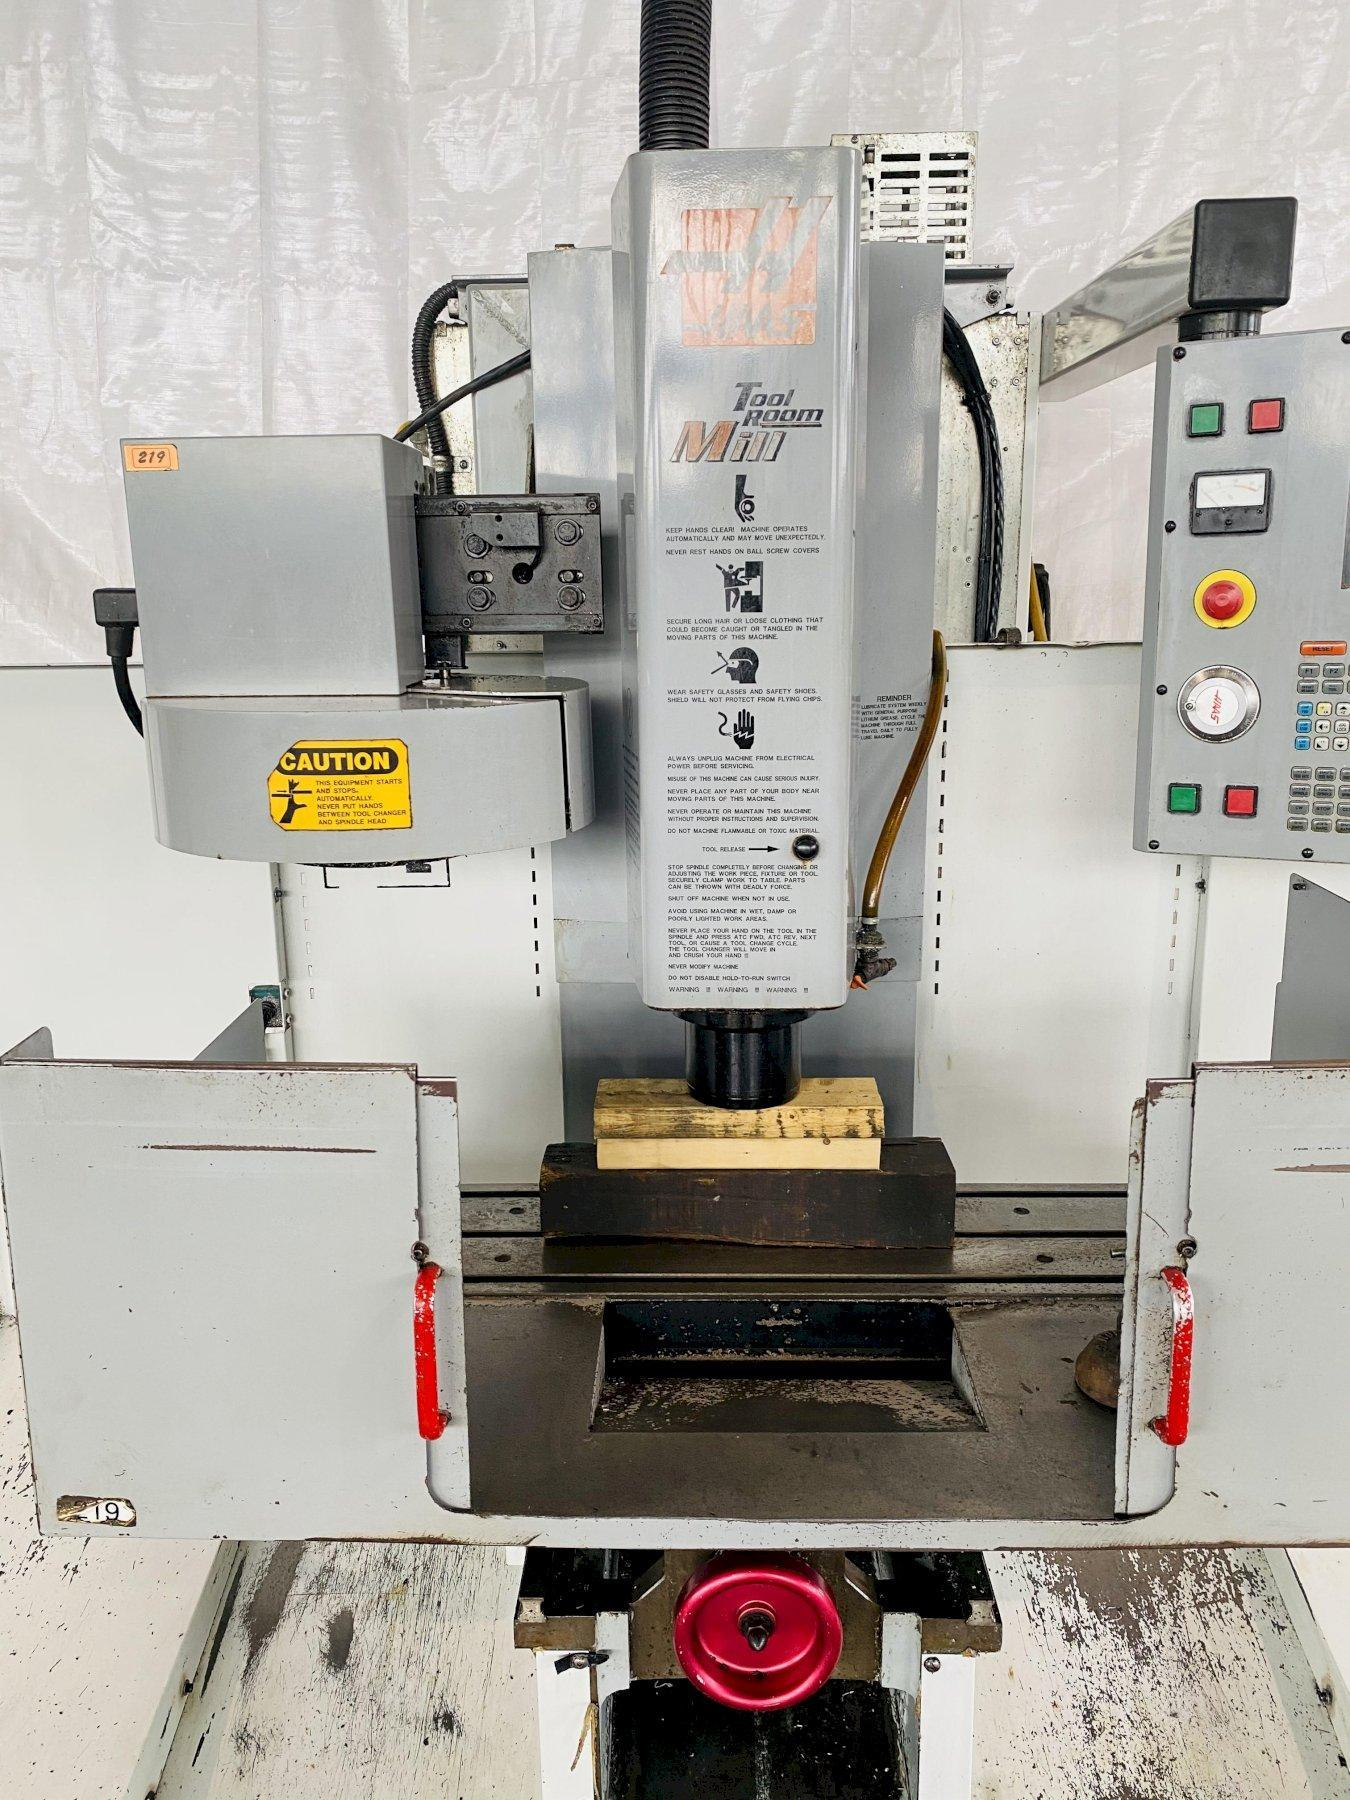 (2003) HAAS TM-1 CNC VERTICAL MACHINING CENTER. STOCK # 0633621